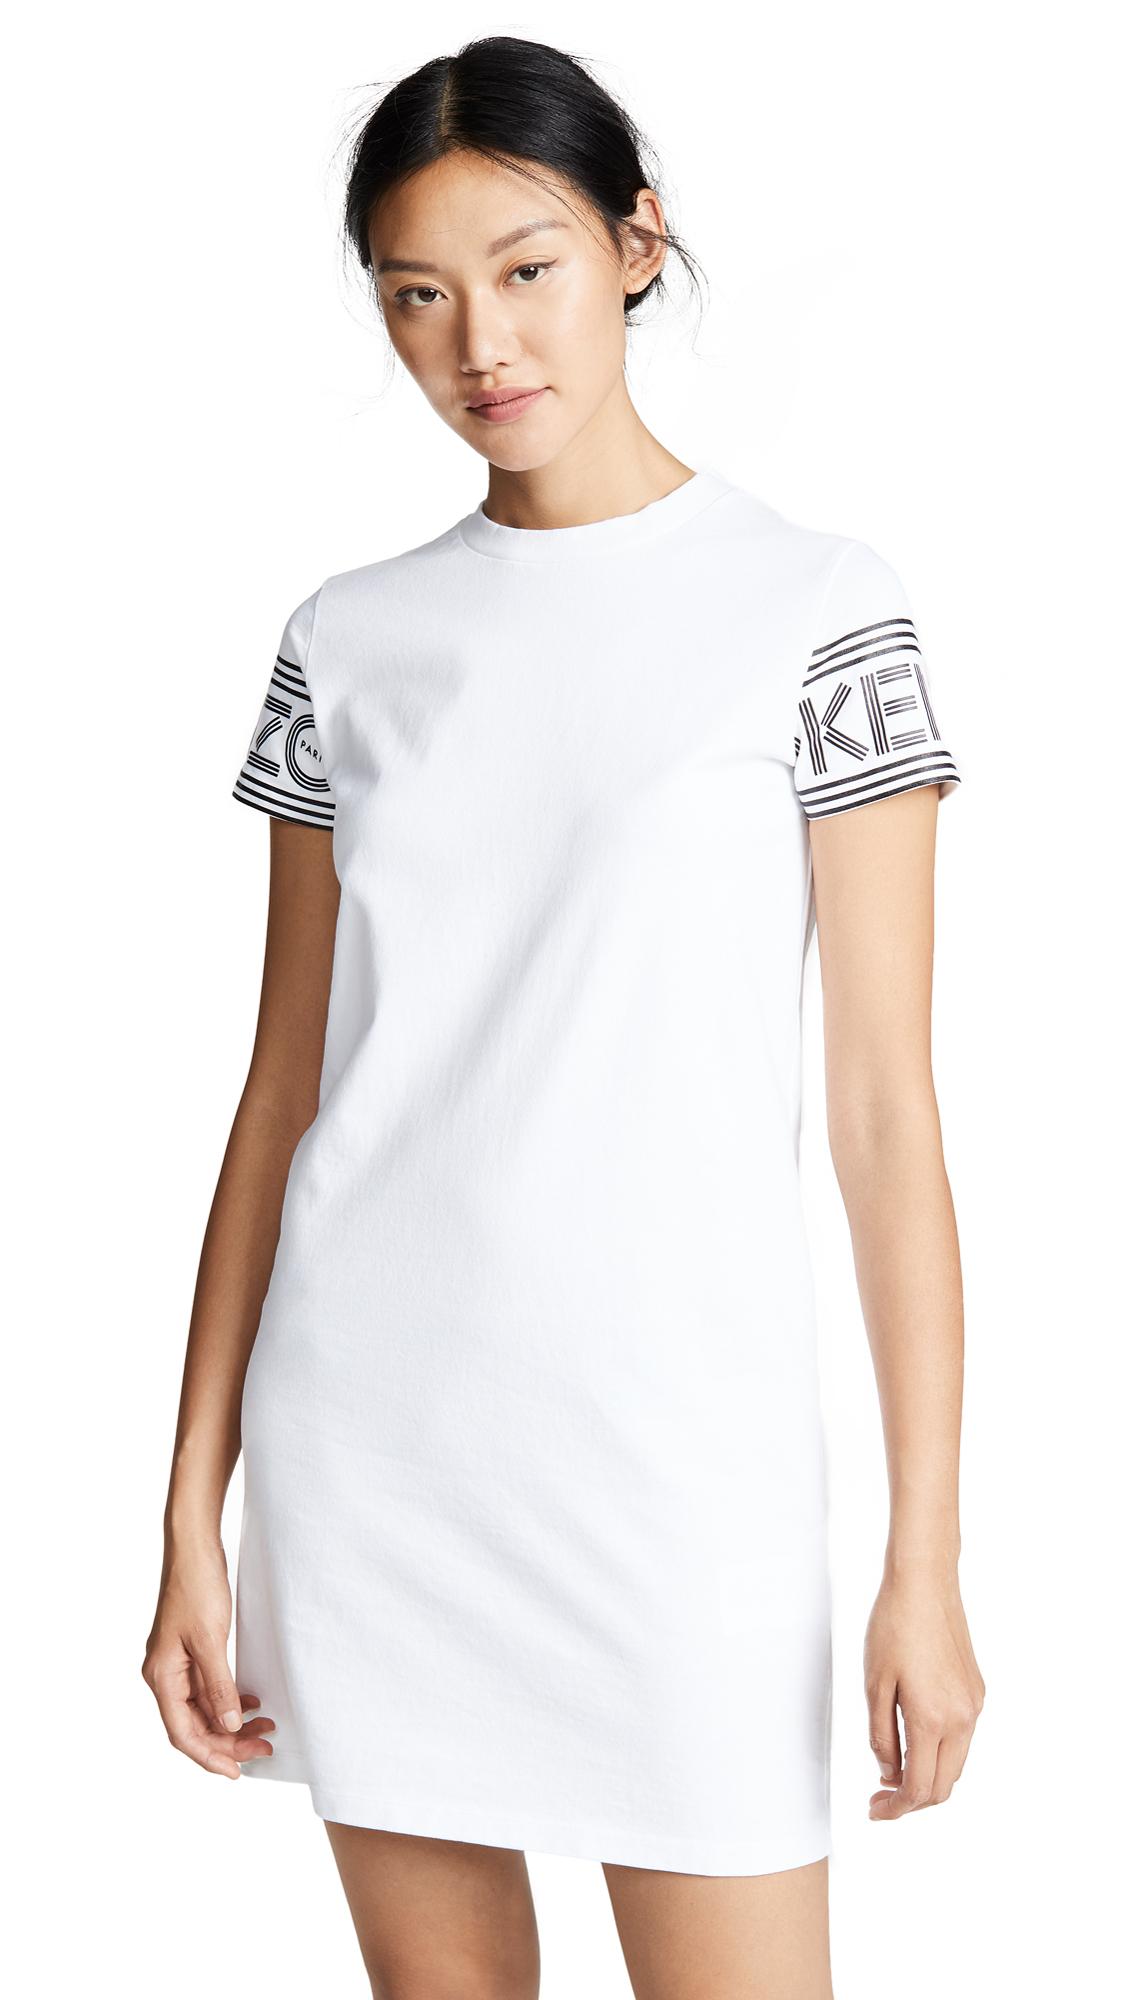 KENZO Kenzo Sport T-Shirt Dress In White